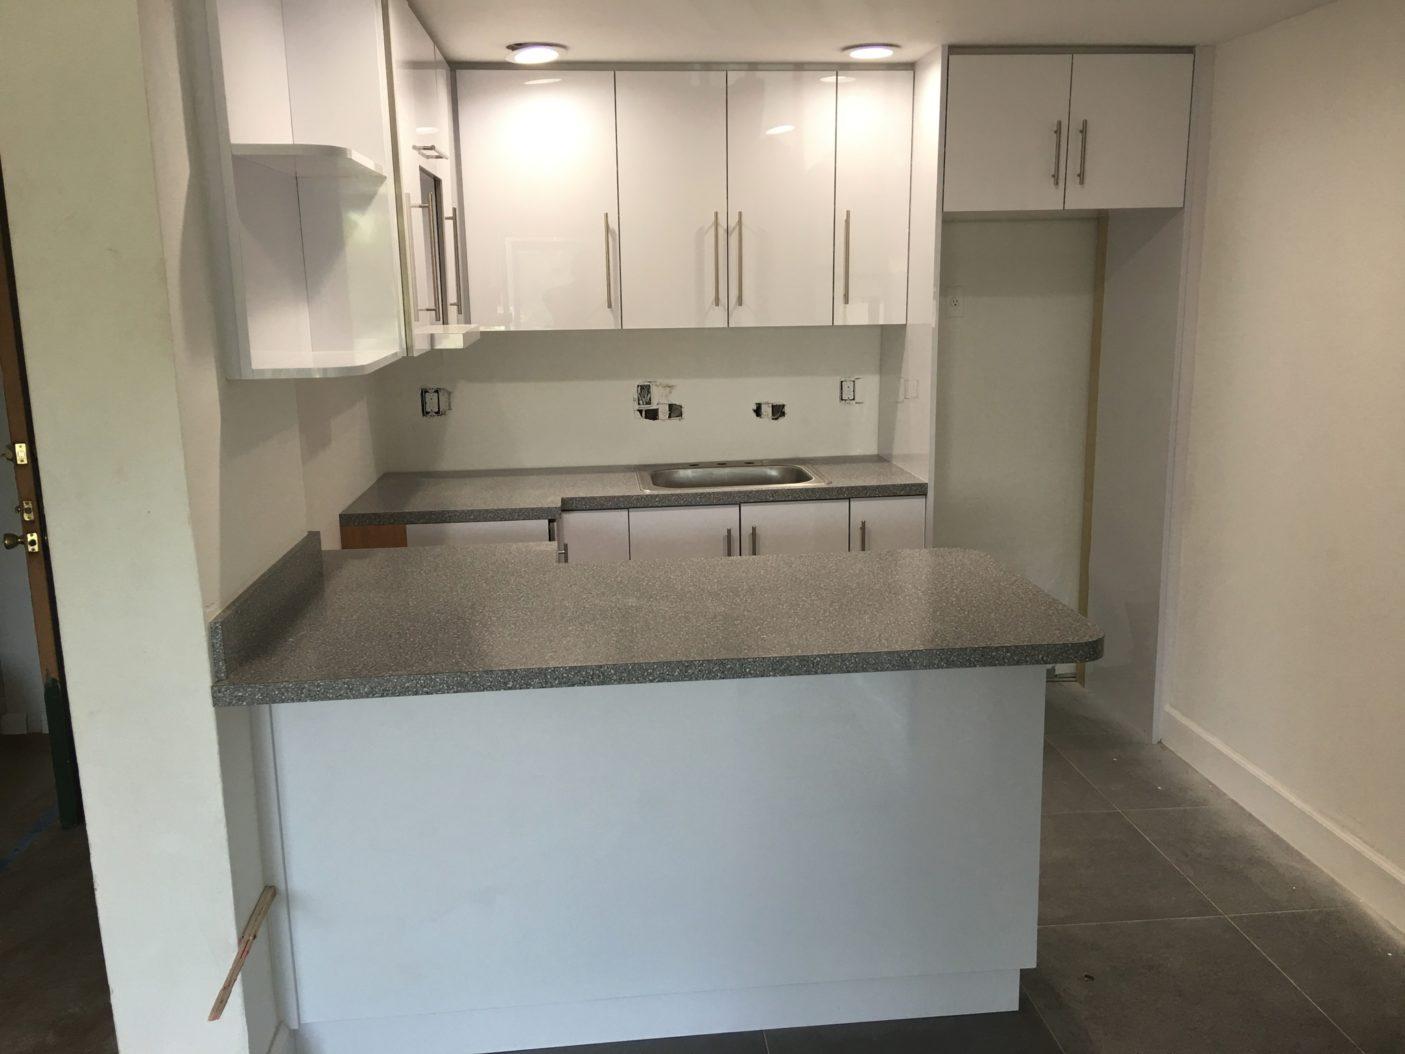 Kitchens-172.jpg